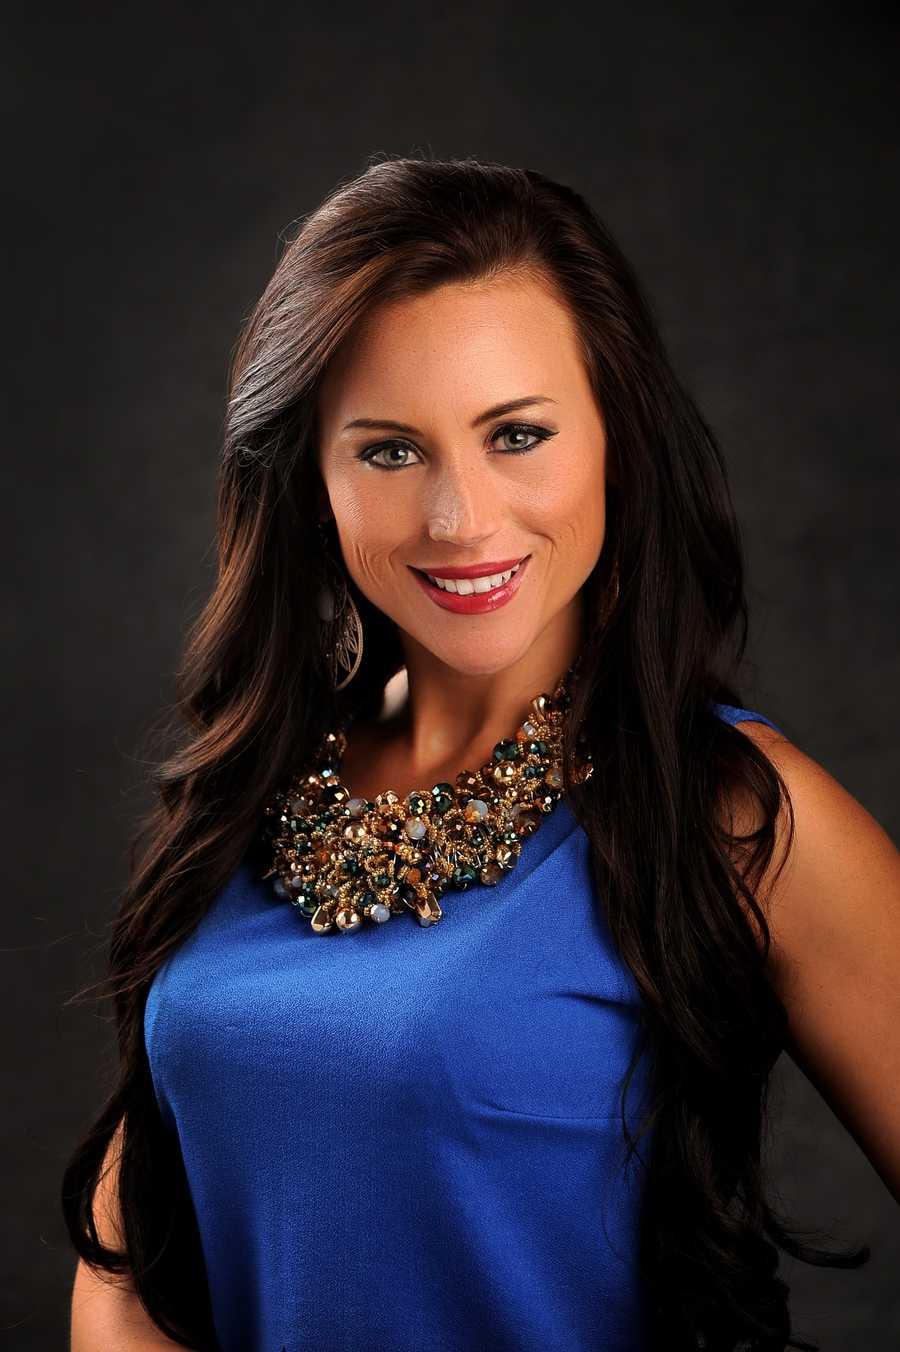 Brandi Holcomb, Miss Otero County